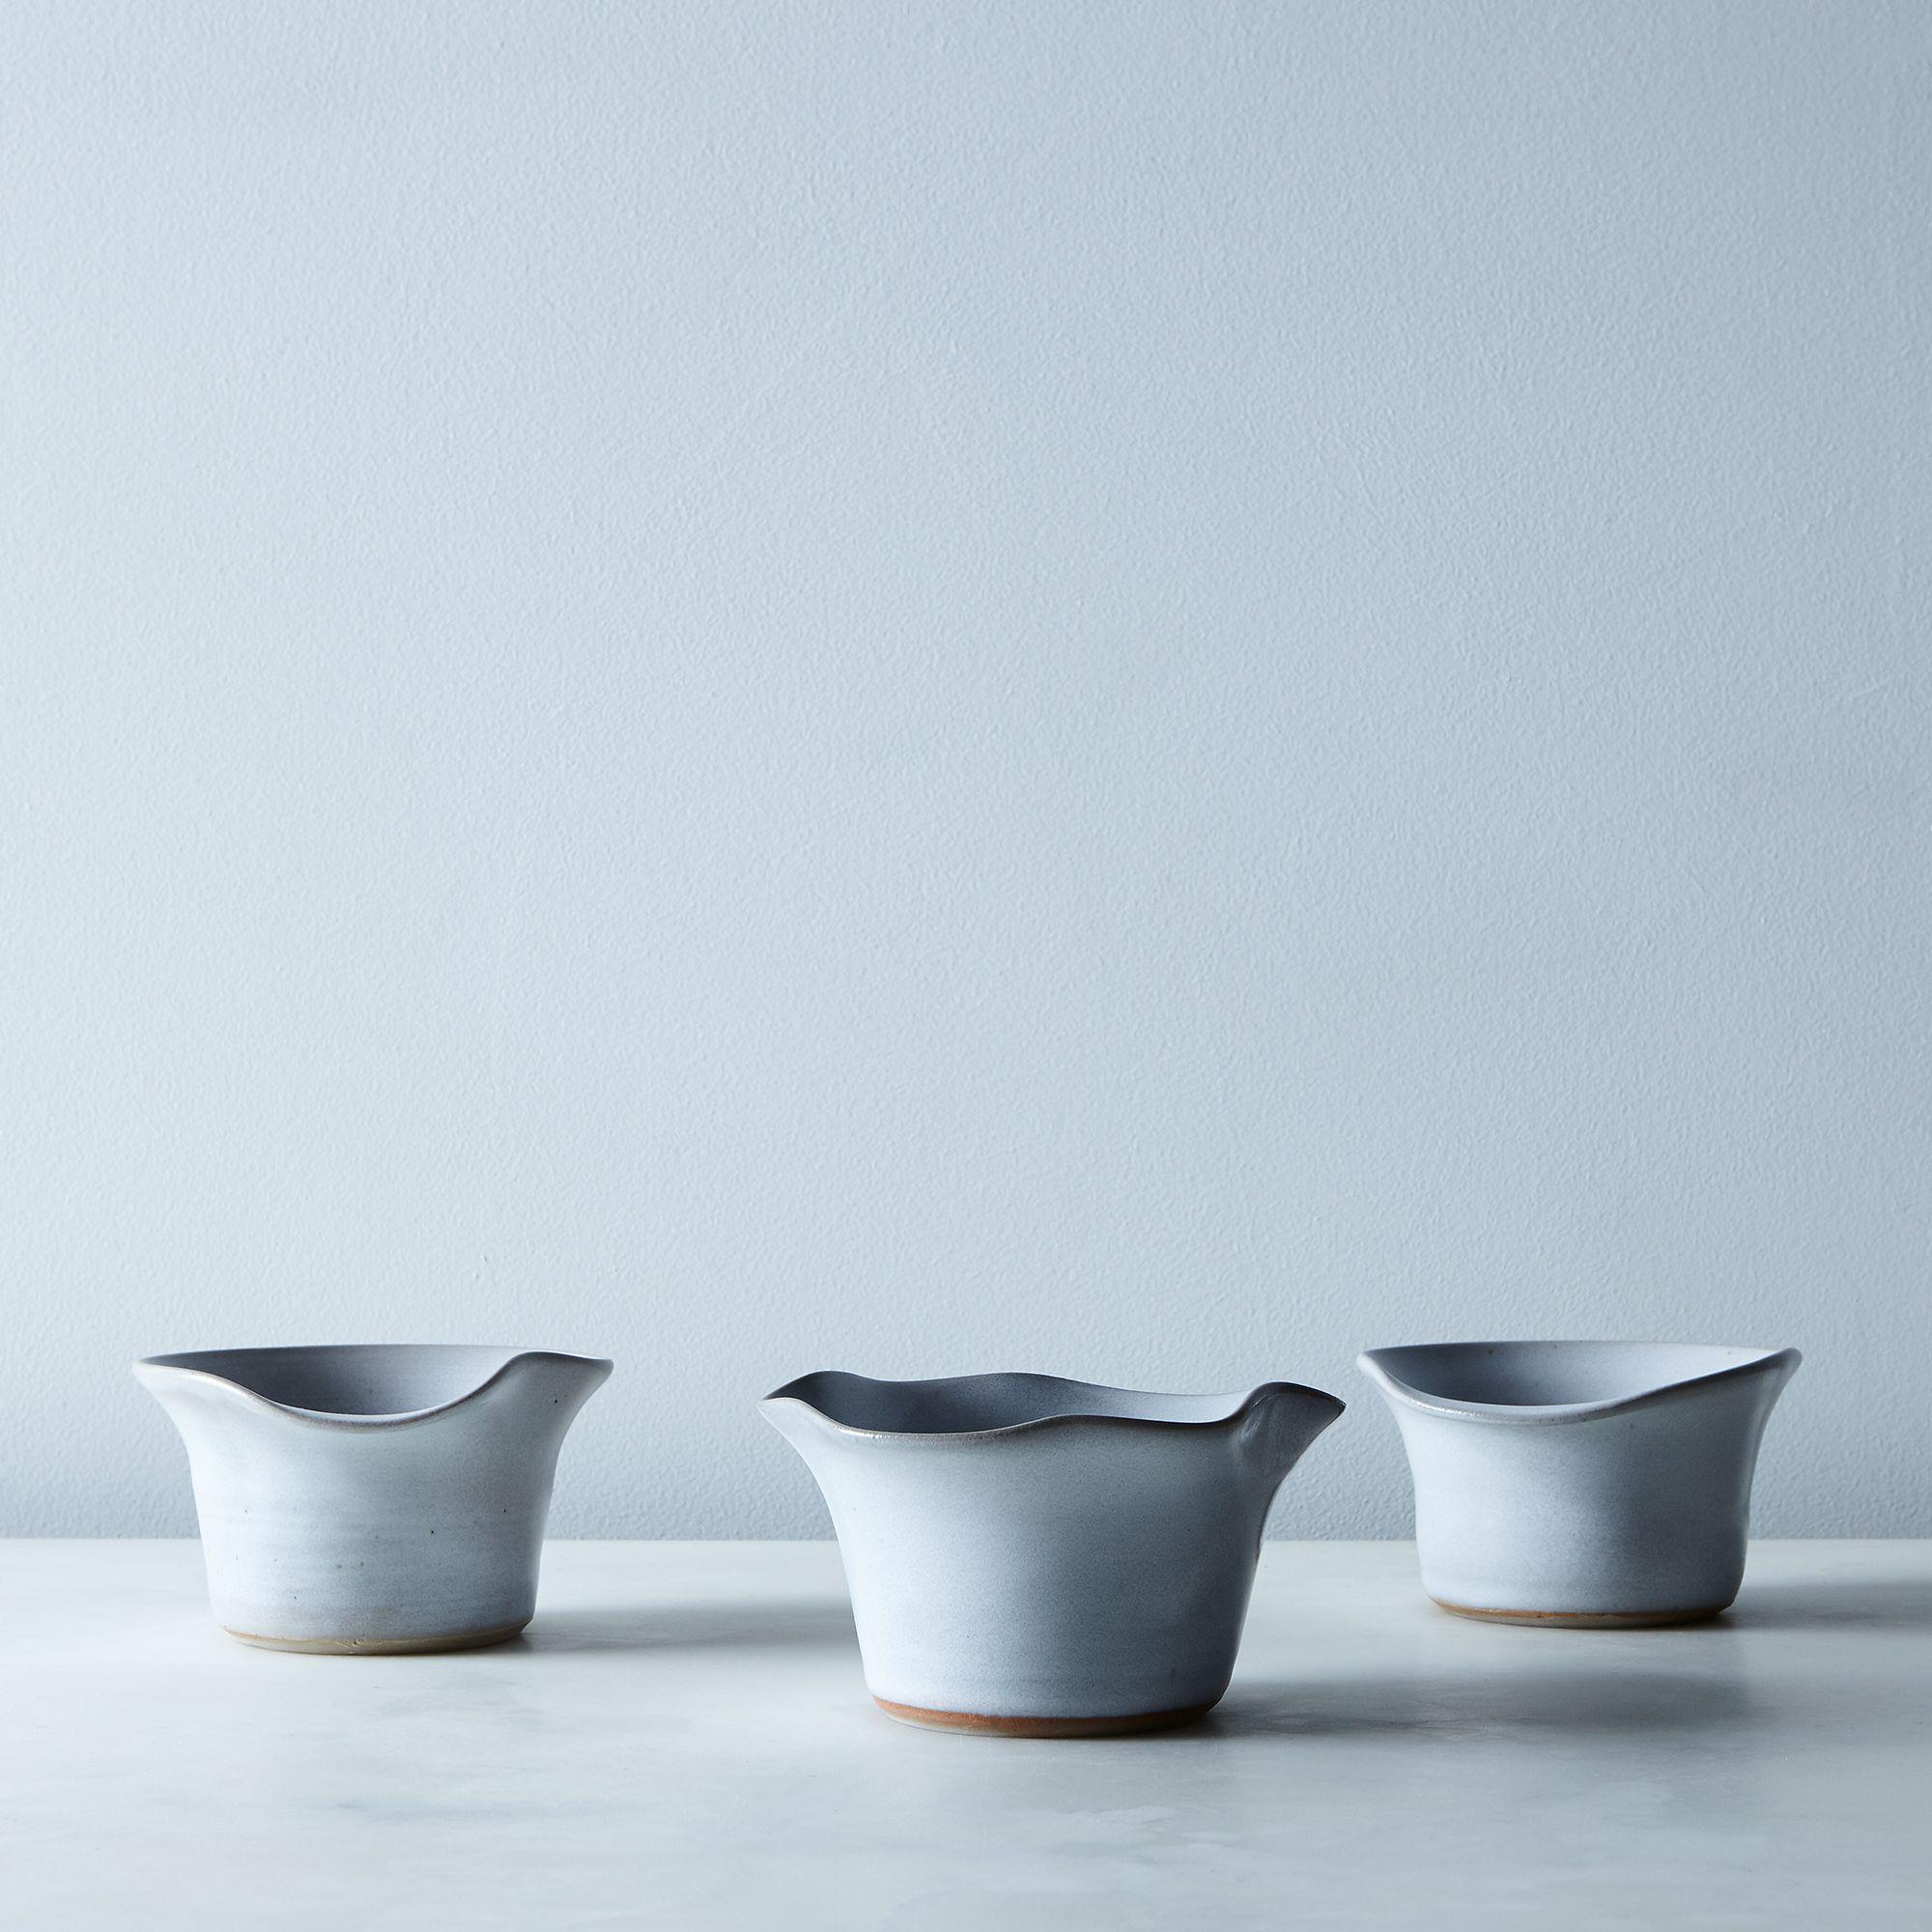 9eed0b52 1b74 46ae a953 9e9dc6c27aa5  2017 0209 moonstar pottery flower petal ikebana vases set of 3 white silo rocky luten 002